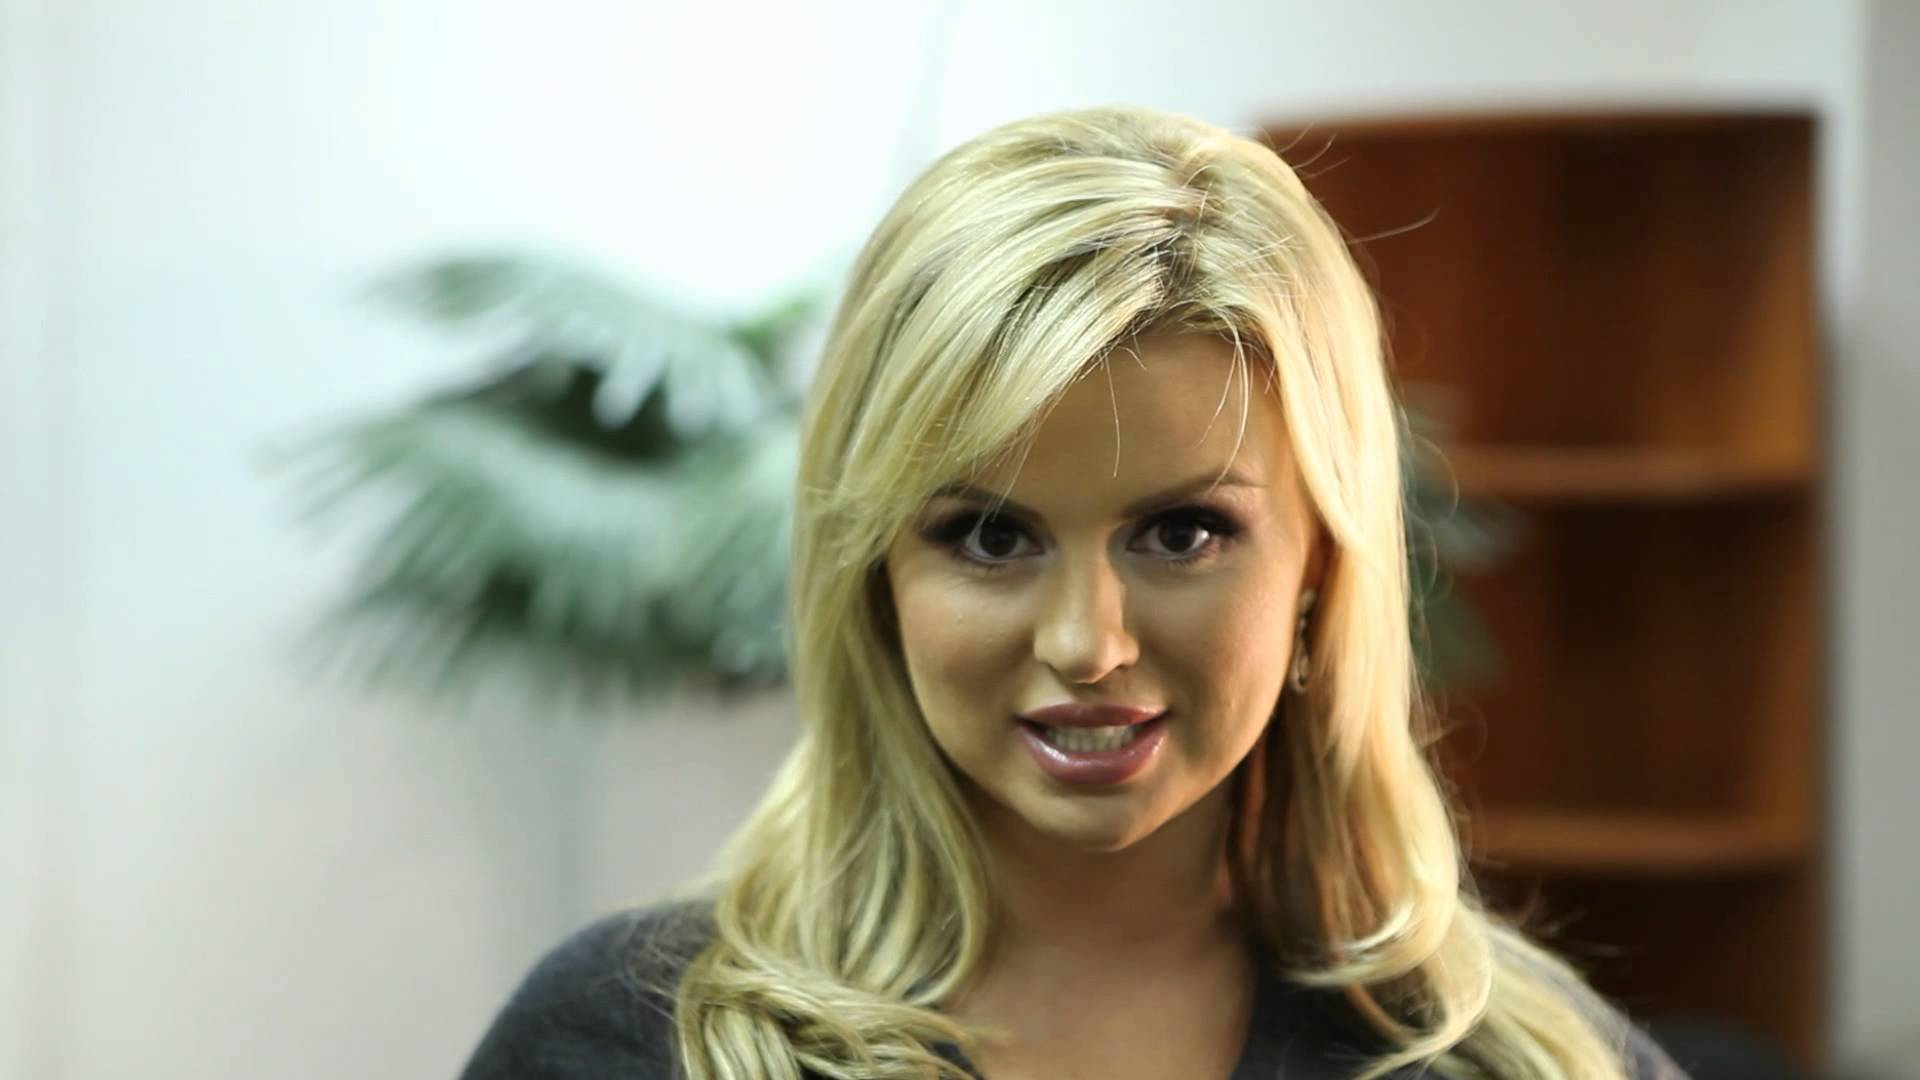 Совершенно голая Анна Семенович и другие знаменитости на Starsru.ru